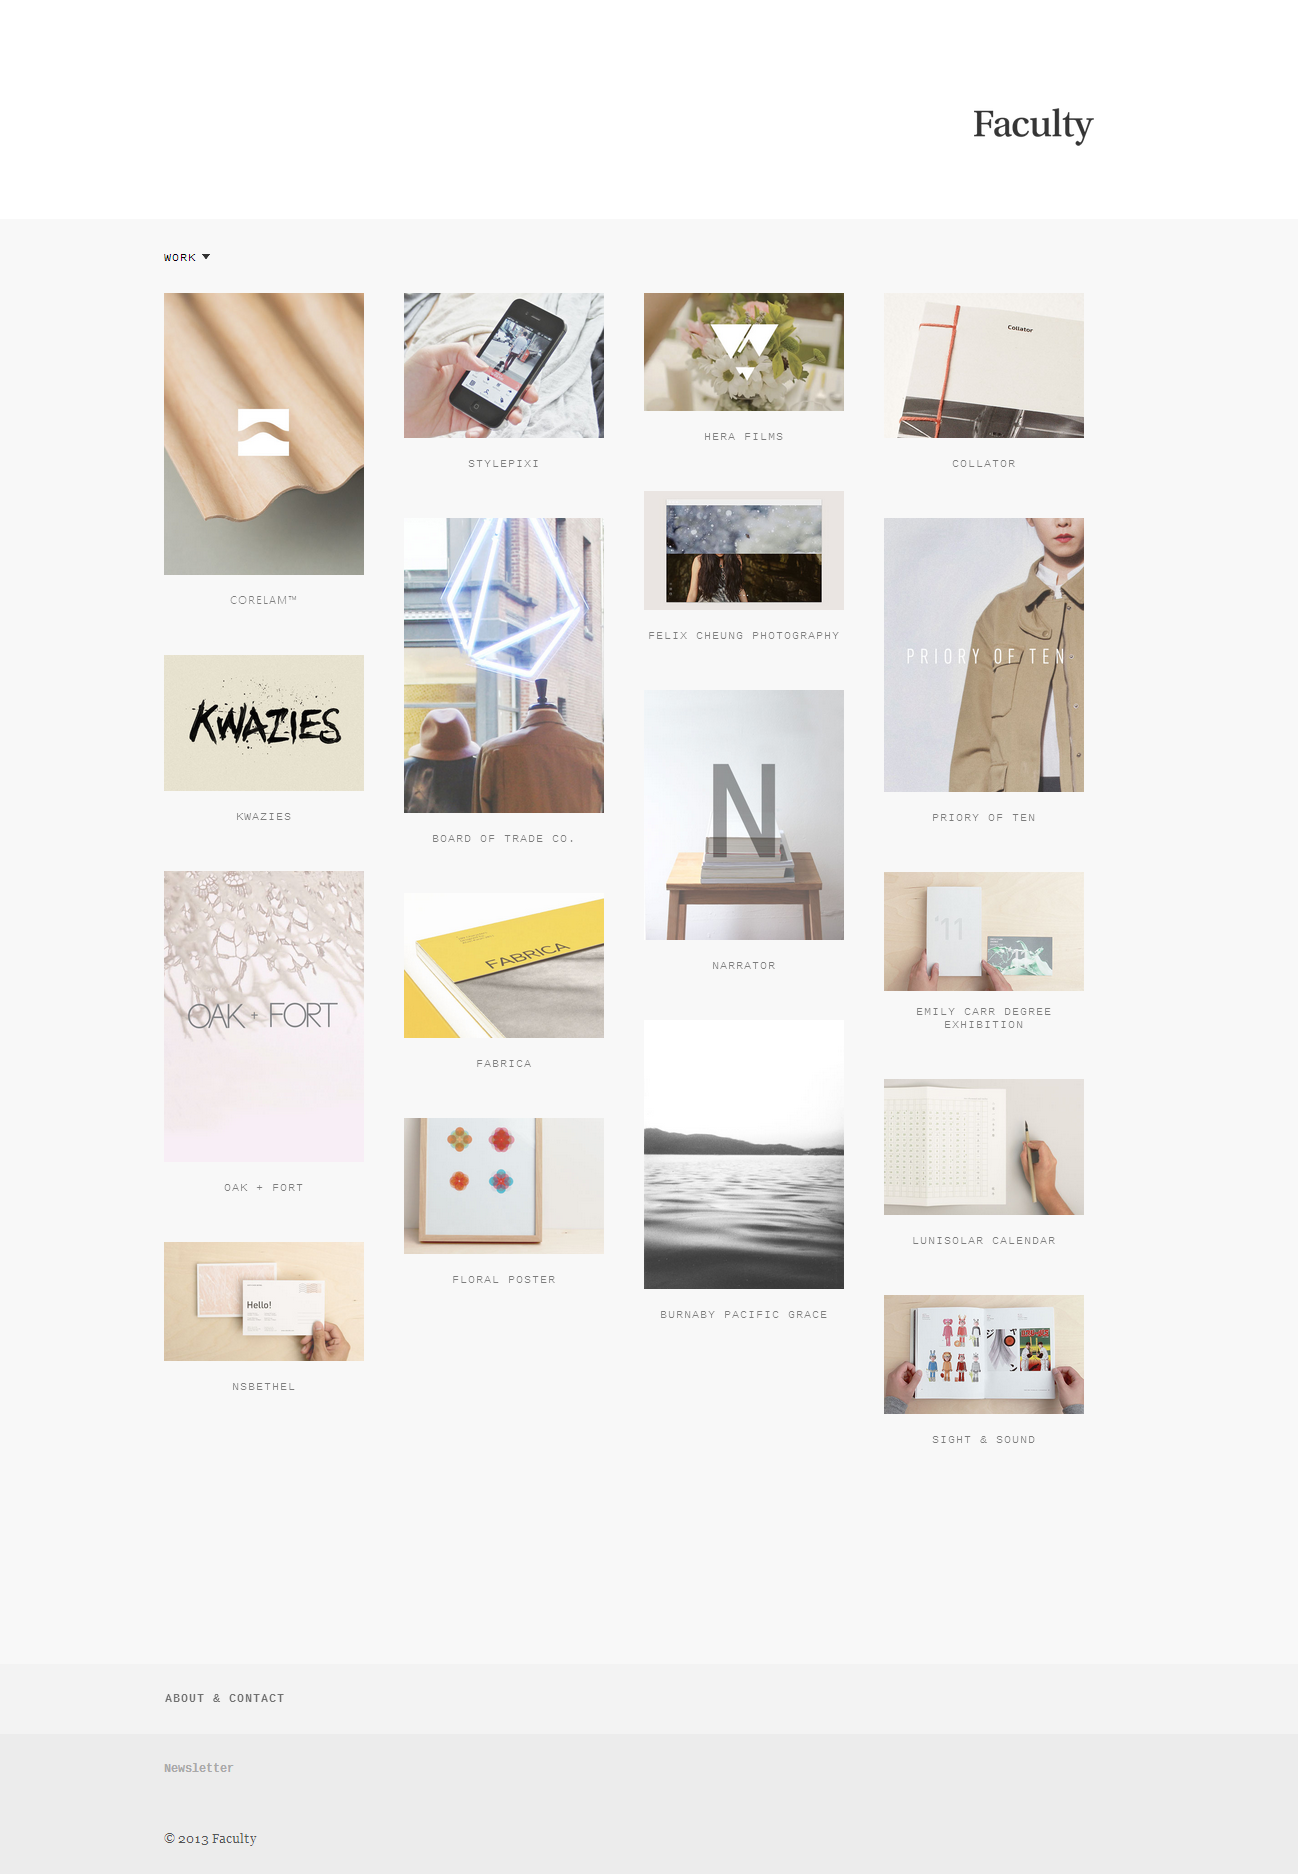 Faculty Vancouver Web Design Graphic Design Mobile App Design Minimalist Web Design Web Design Web Design Company